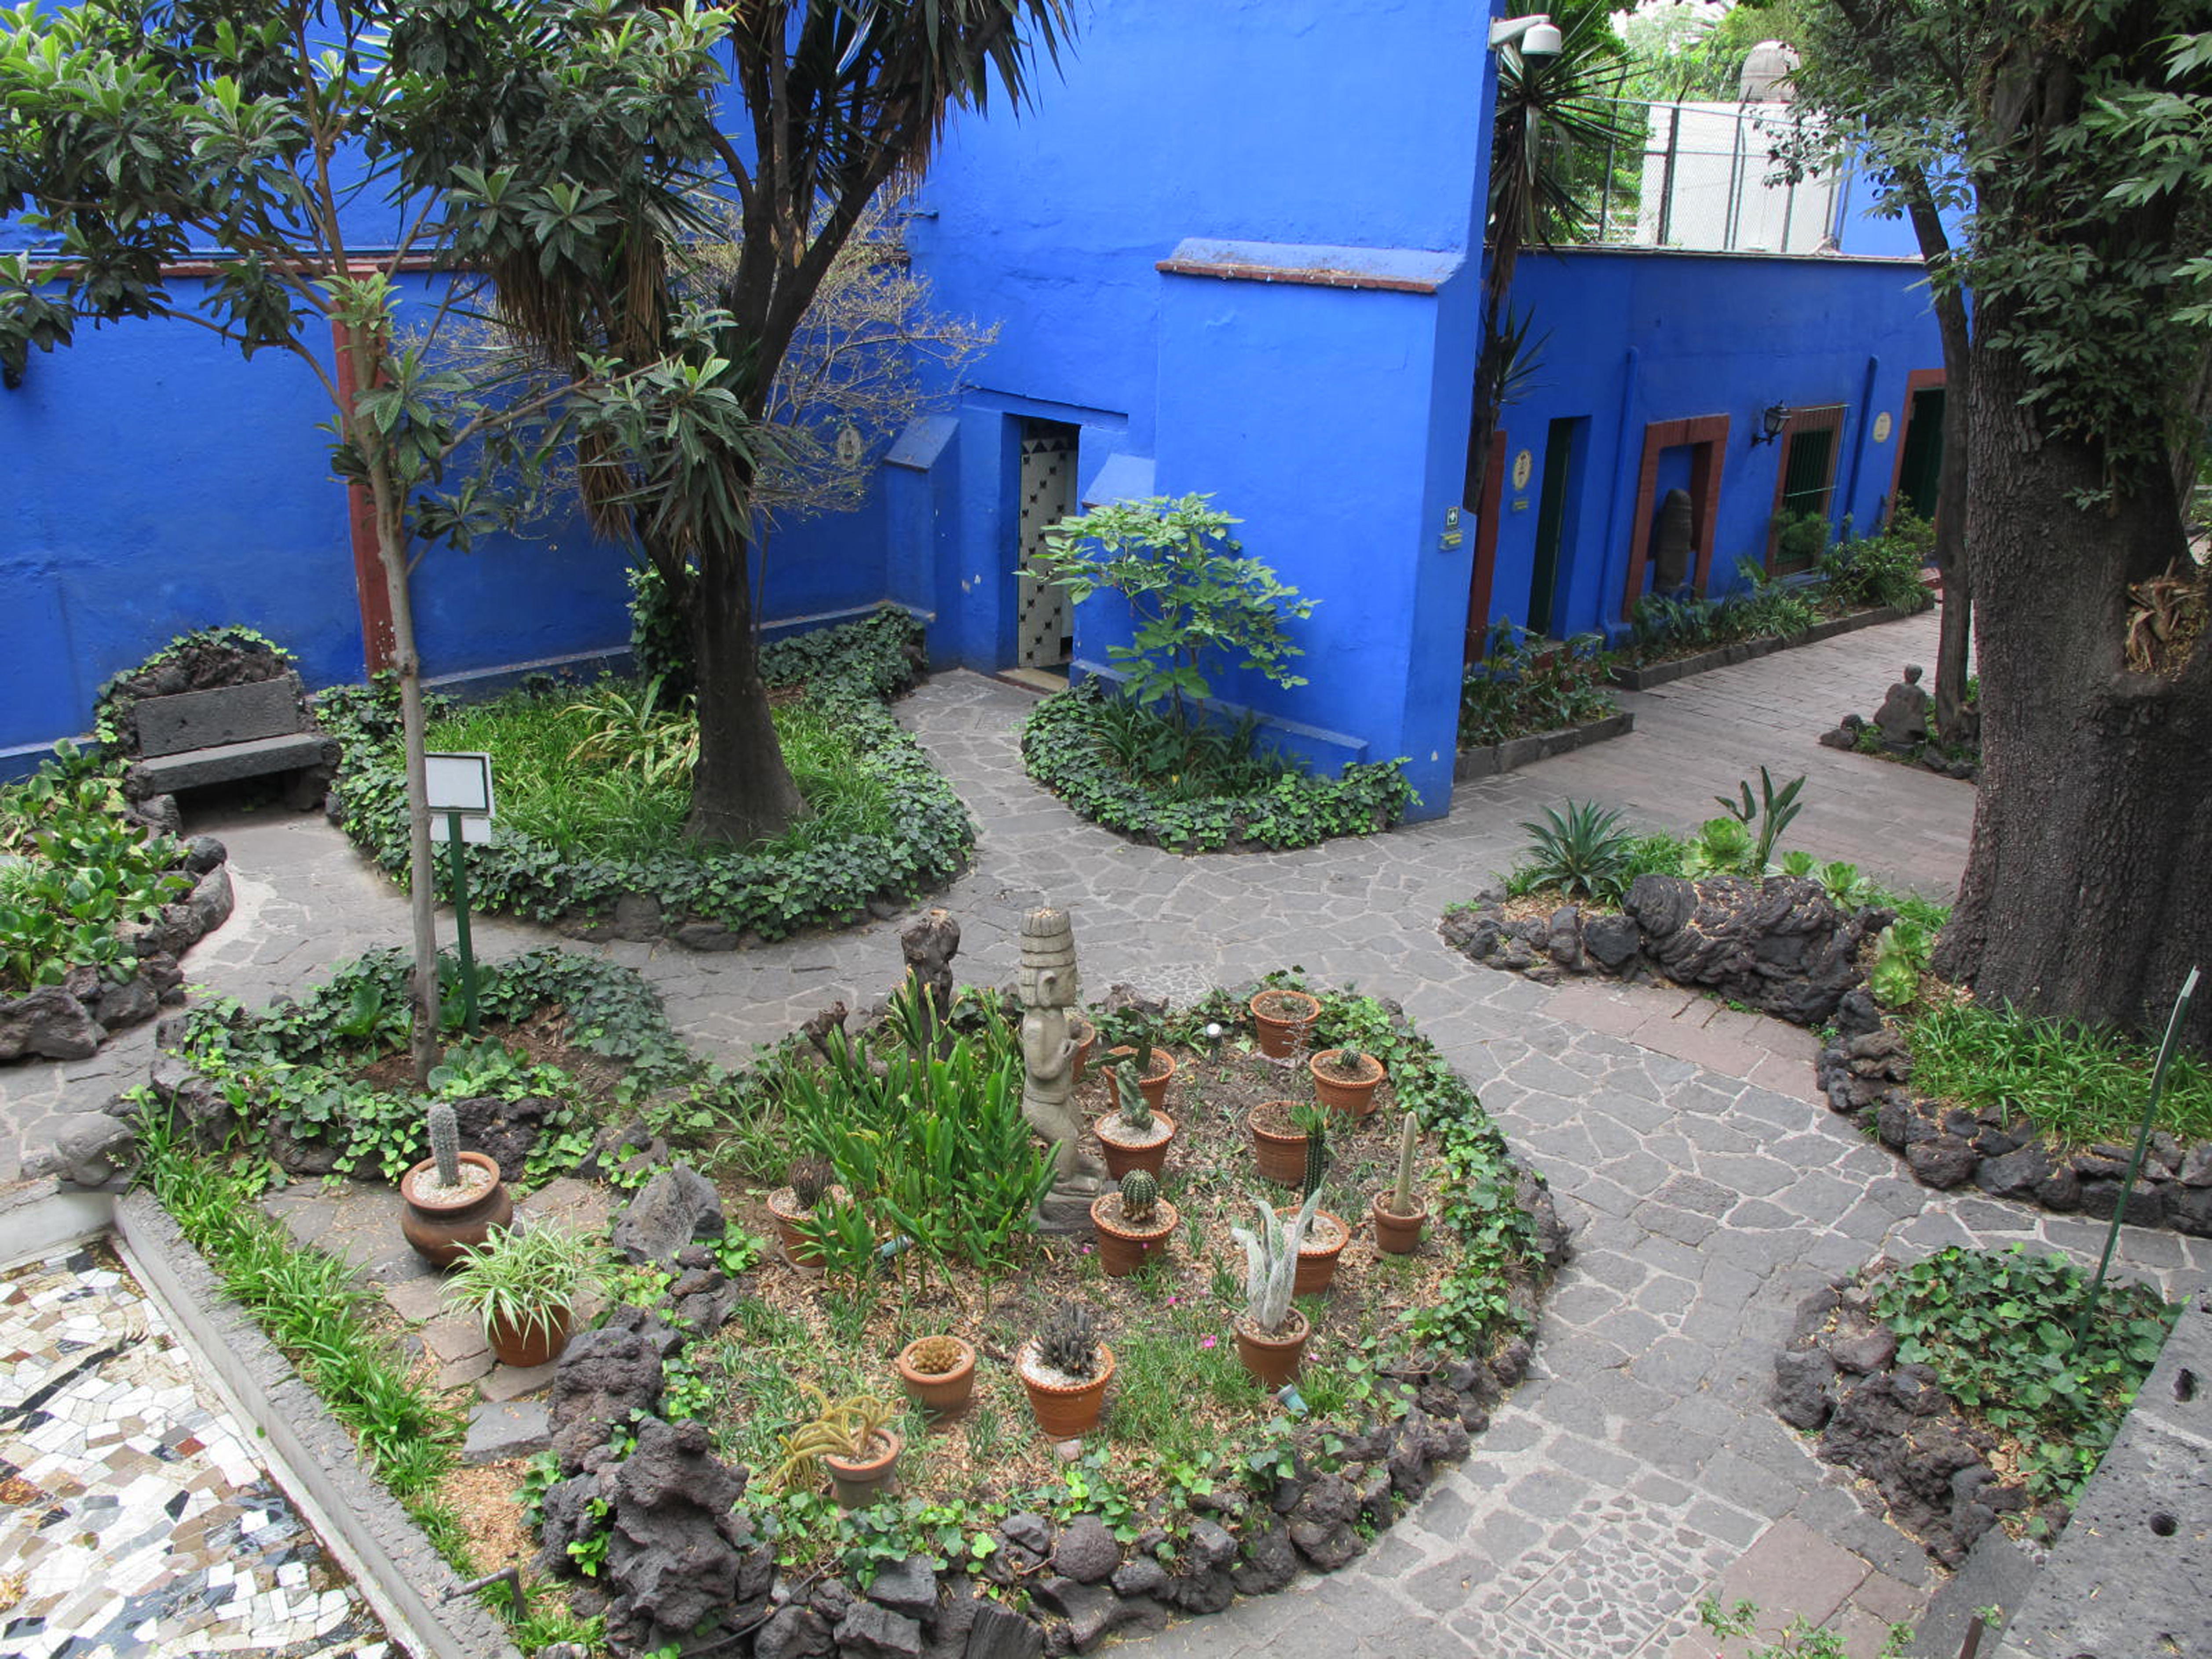 Frida Kahlo's Casa Azul Garden Is Still Thriving—Six Decades after